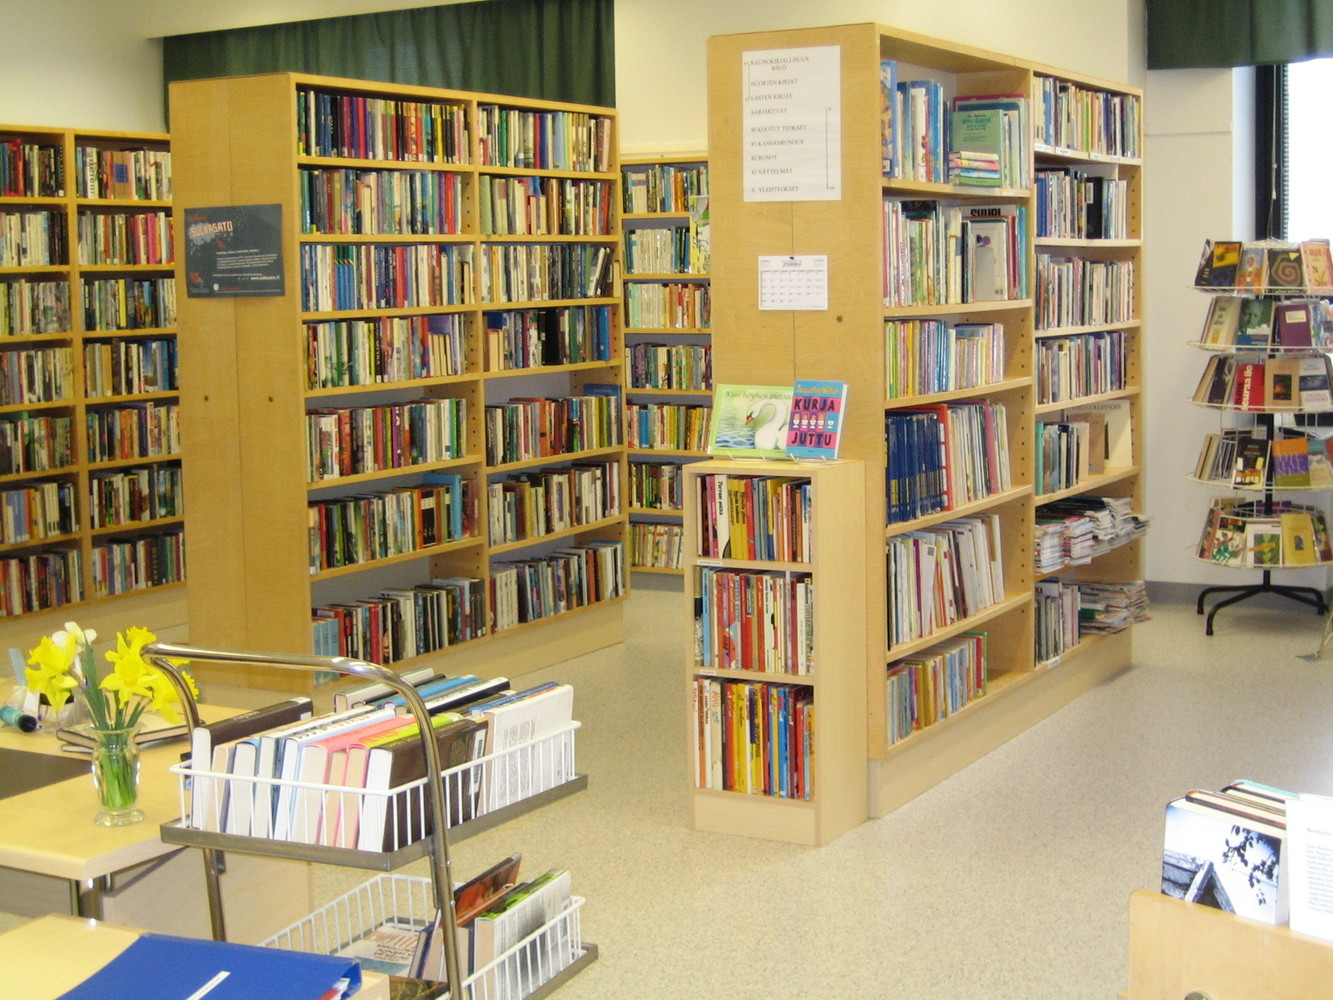 Törnävä Hospital Library